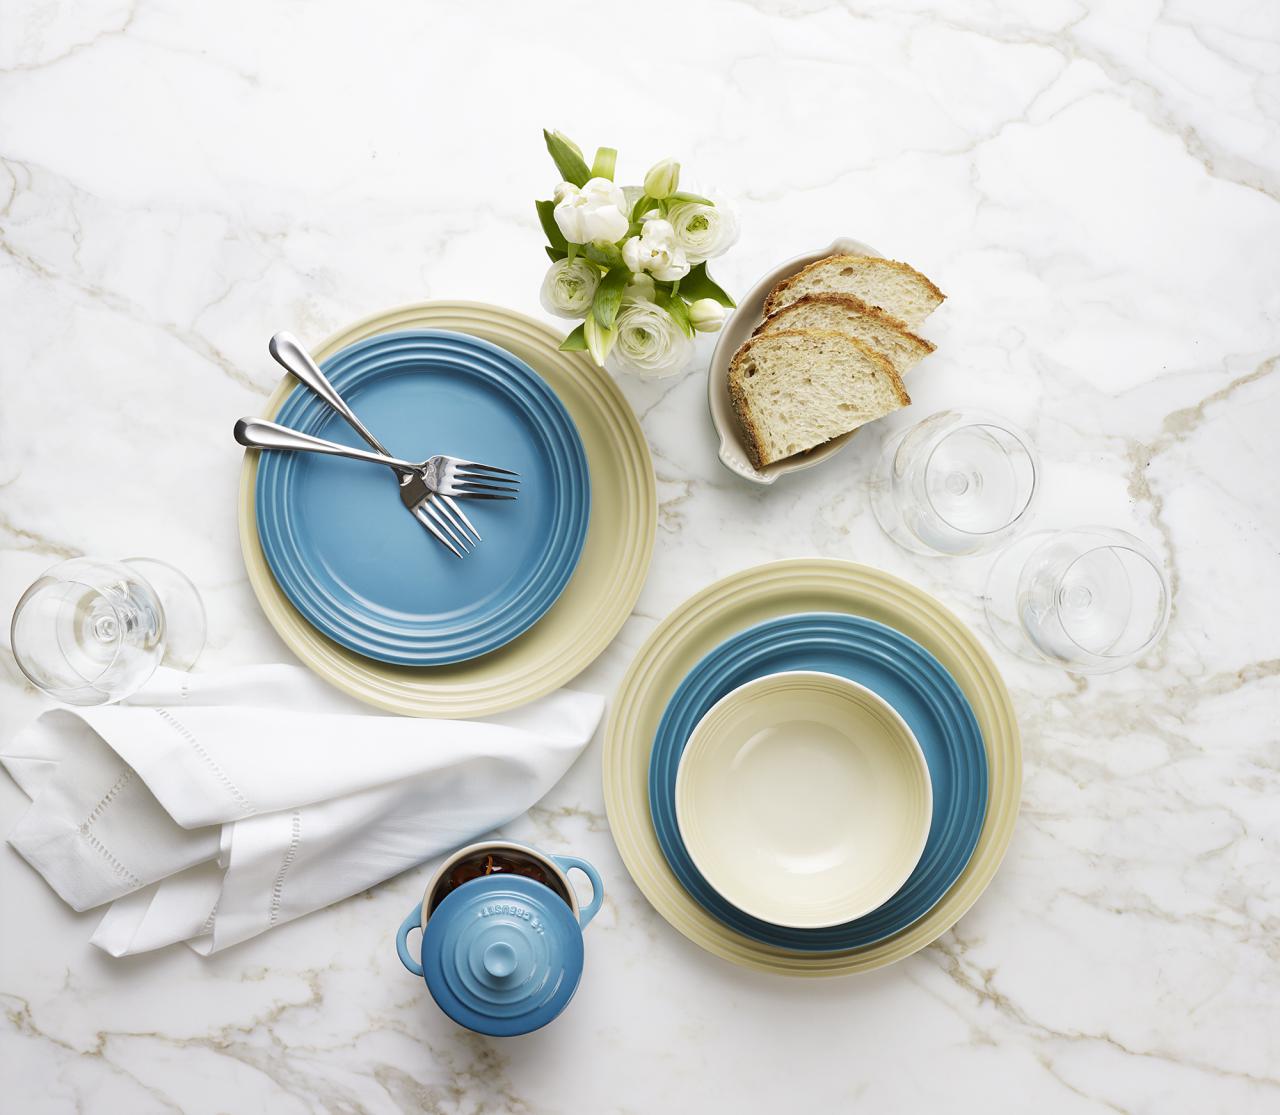 Tableware_Lifestyle_Setting2. Le Creusetu0027s dinnerware ... & Le Creuset Debuts New Dinnerware Range in a Rainbow of Colours - My ...